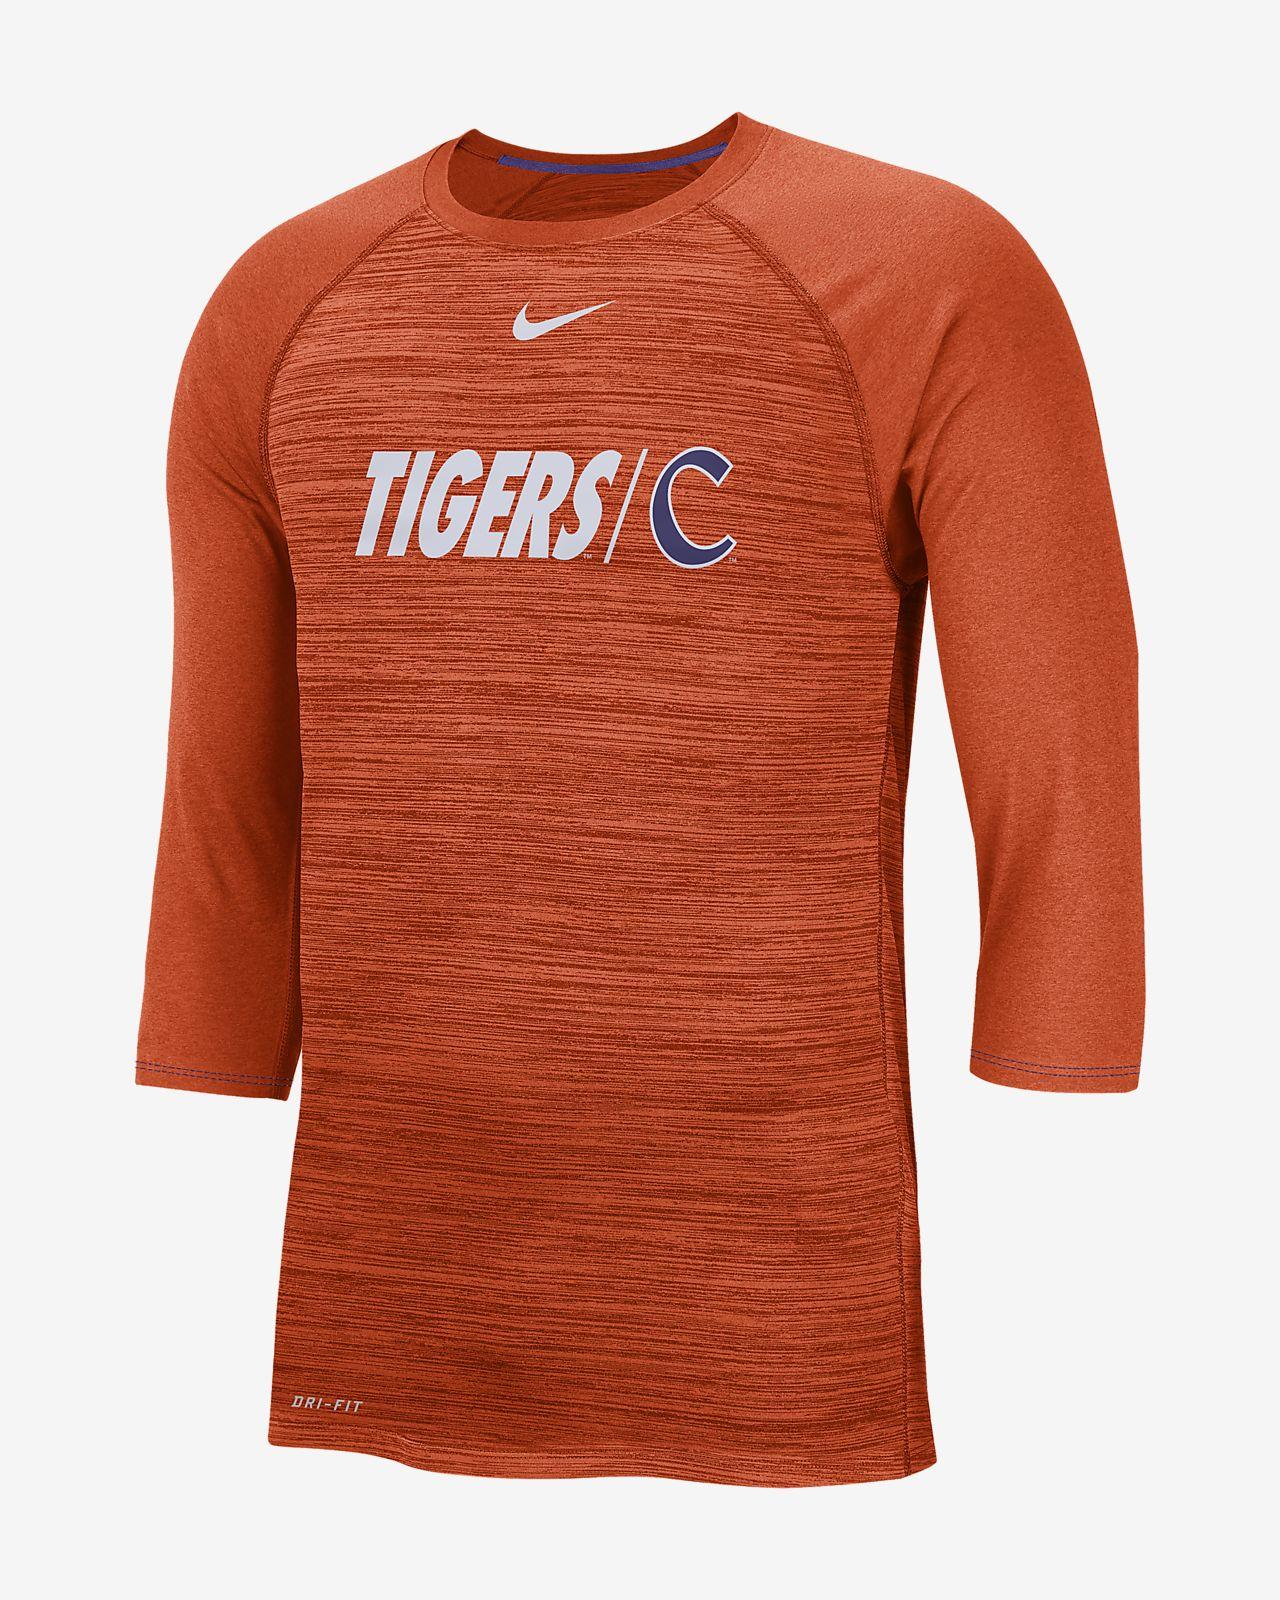 7b7bca39618fa Nike College Dri-FIT Legend (Clemson) Men s 3 4-Sleeve Top. Nike.com